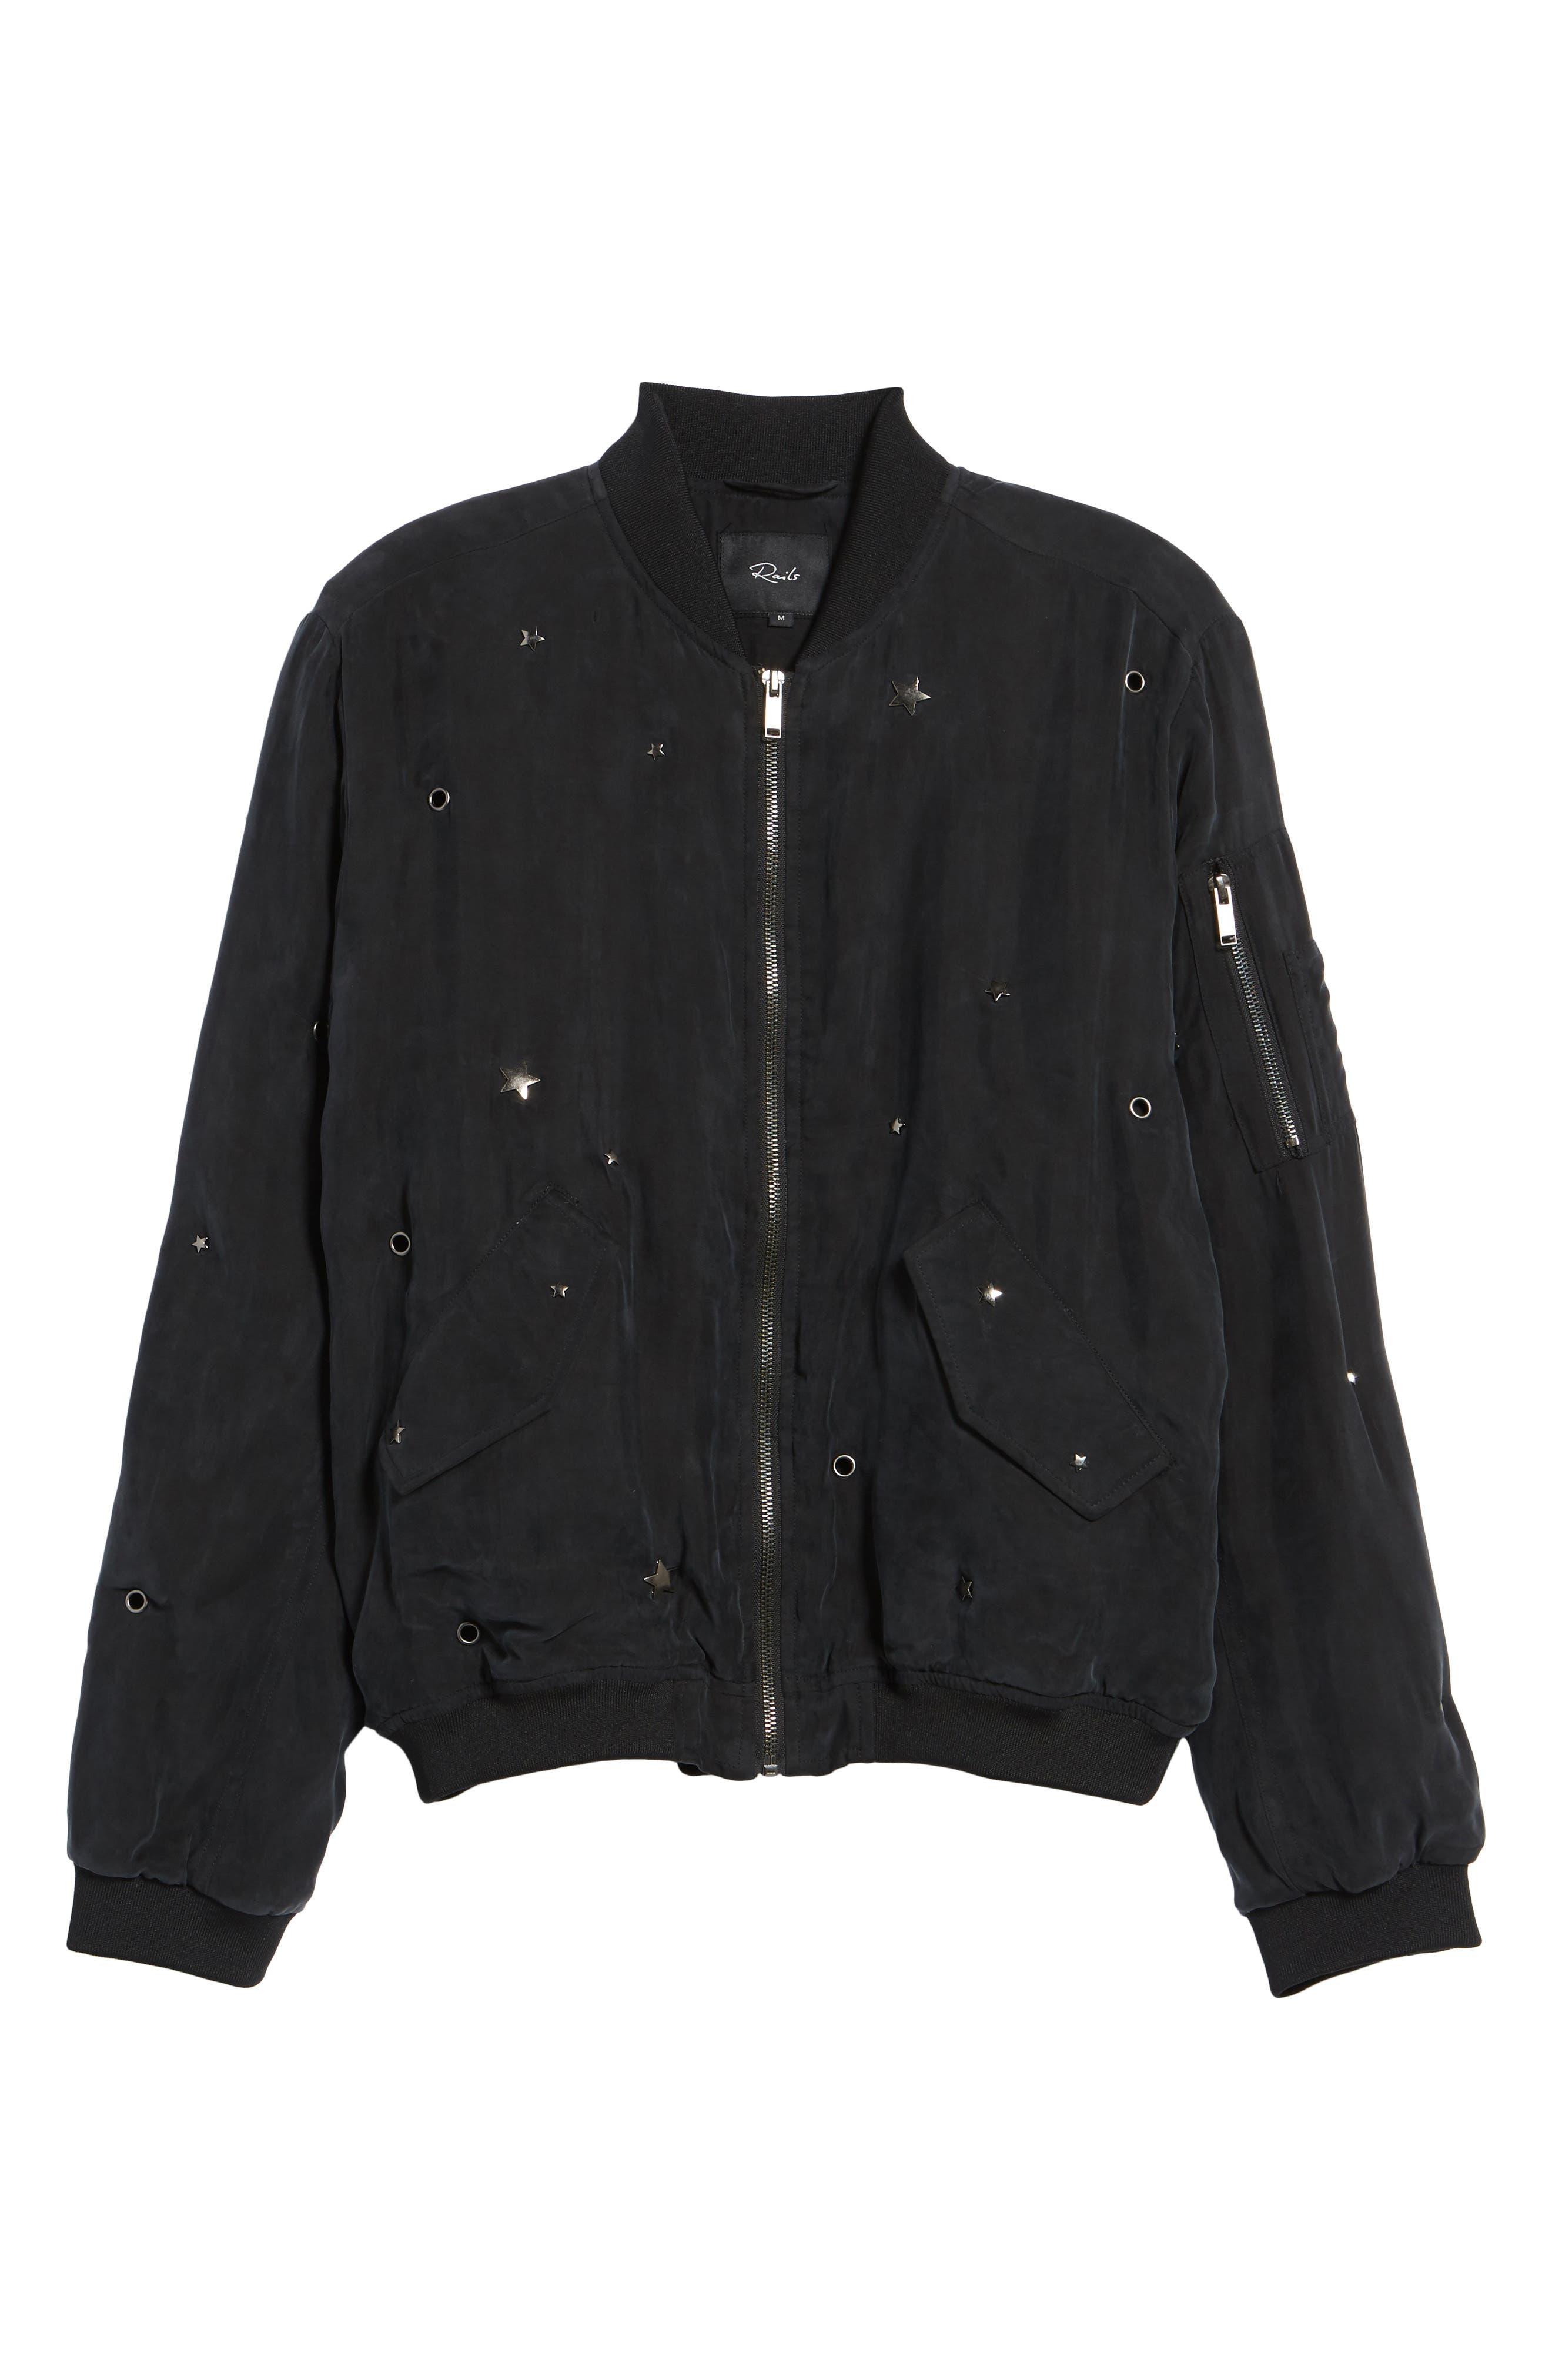 Ace Embellished Bomber Jacket,                             Alternate thumbnail 5, color,                             001